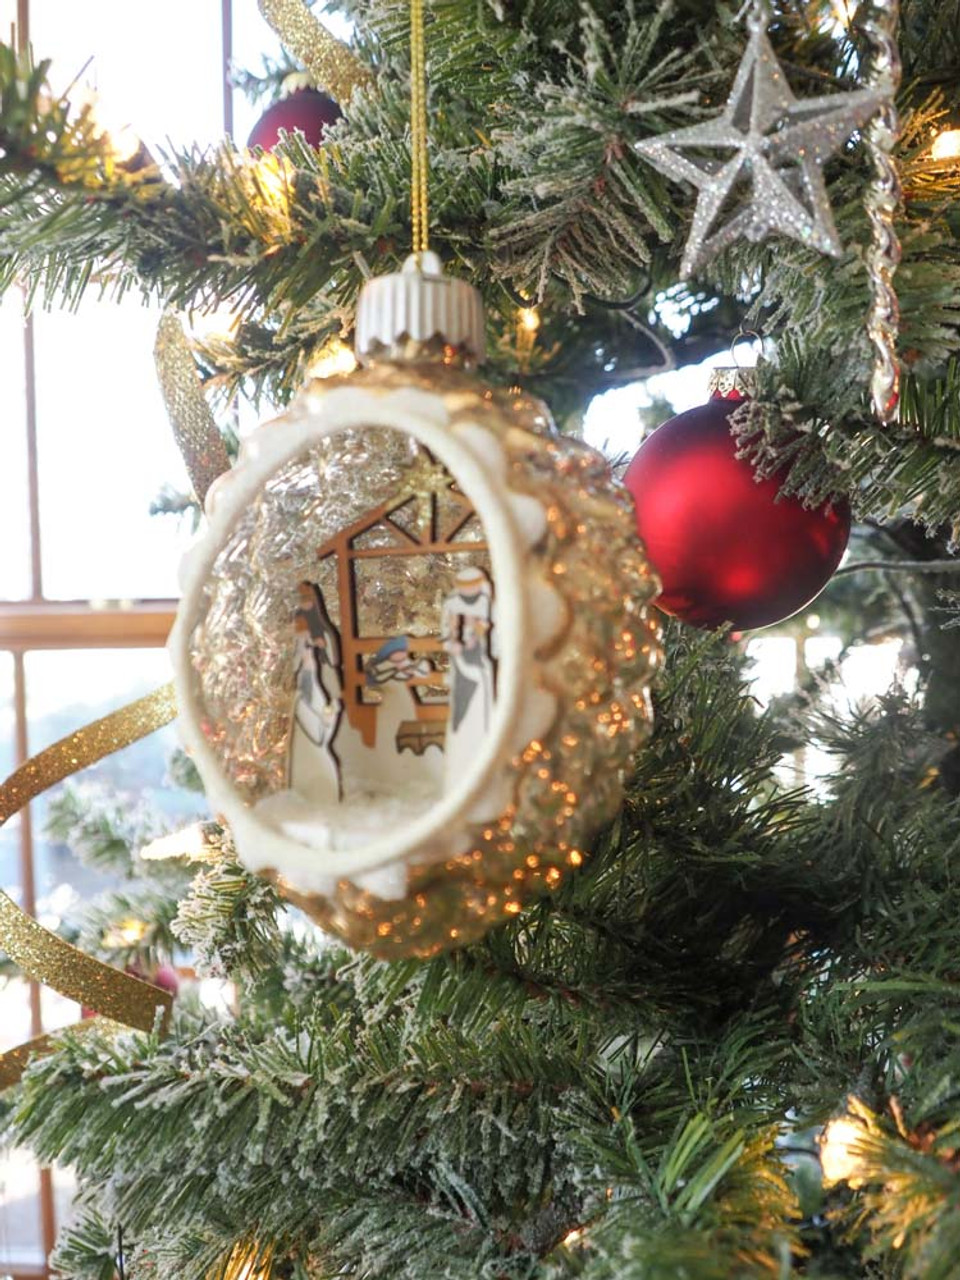 glass led ornament with nativity scene